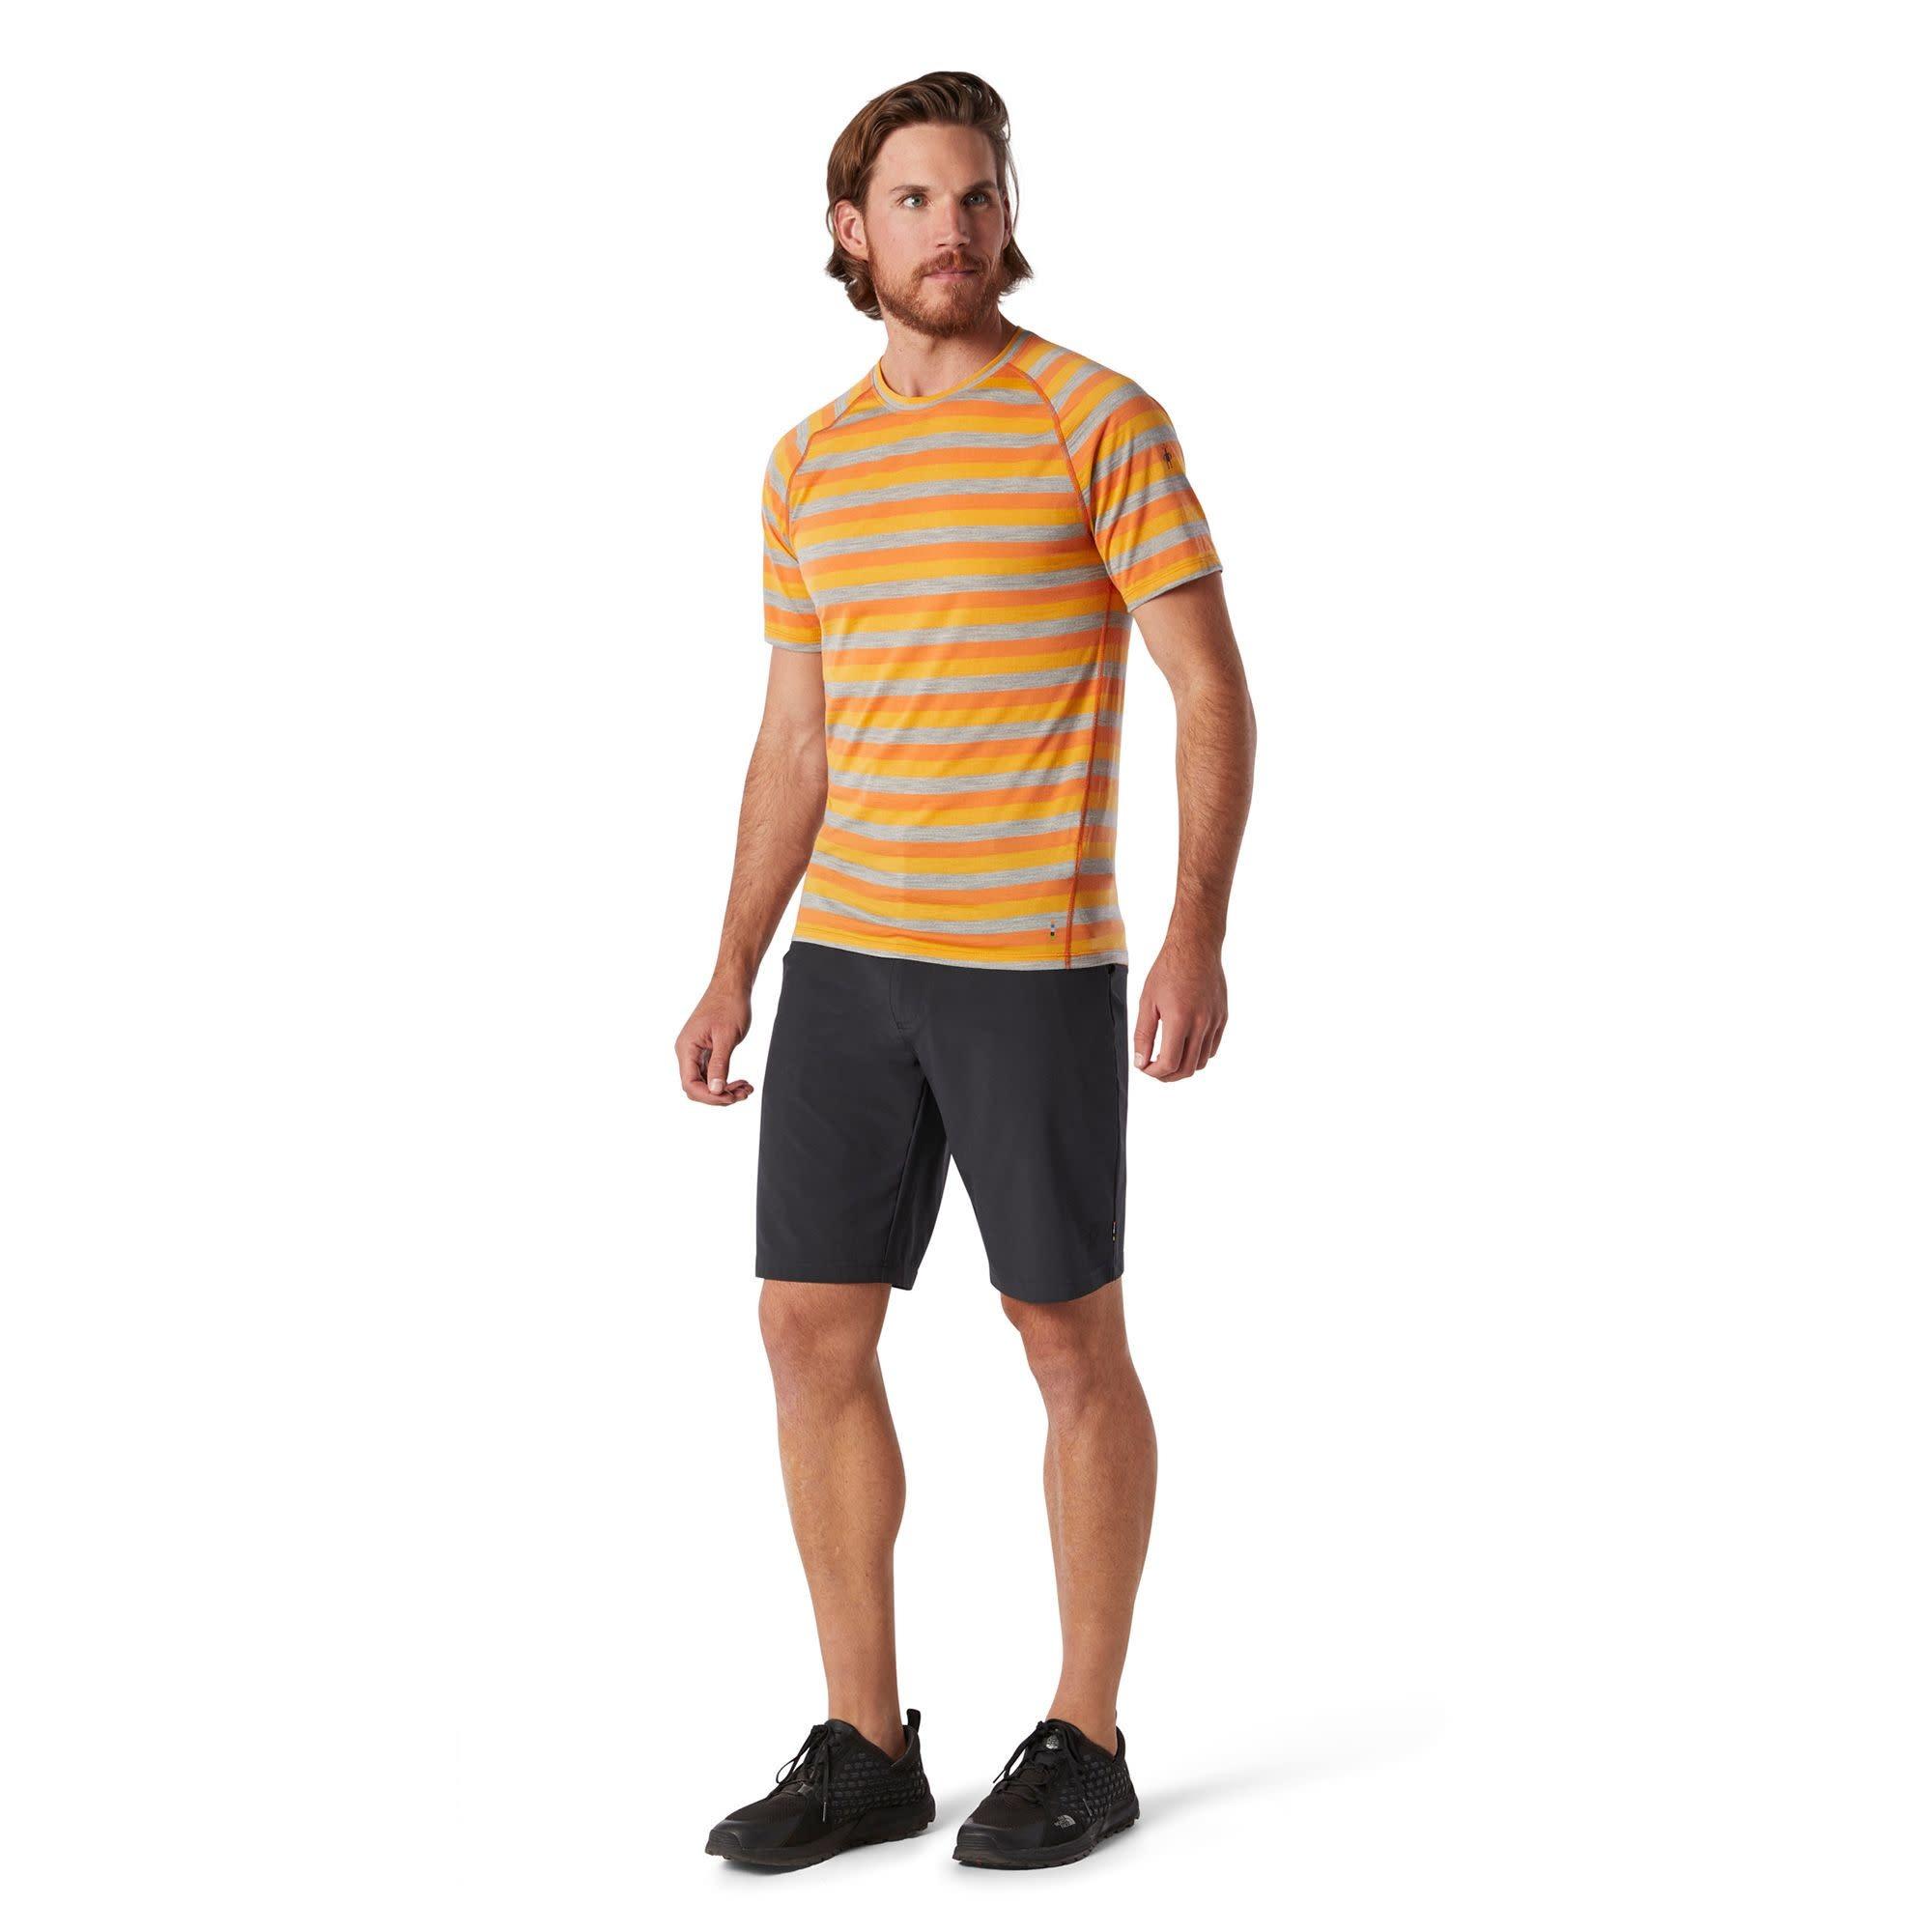 Smartwool Merino 150 Short Sleeve